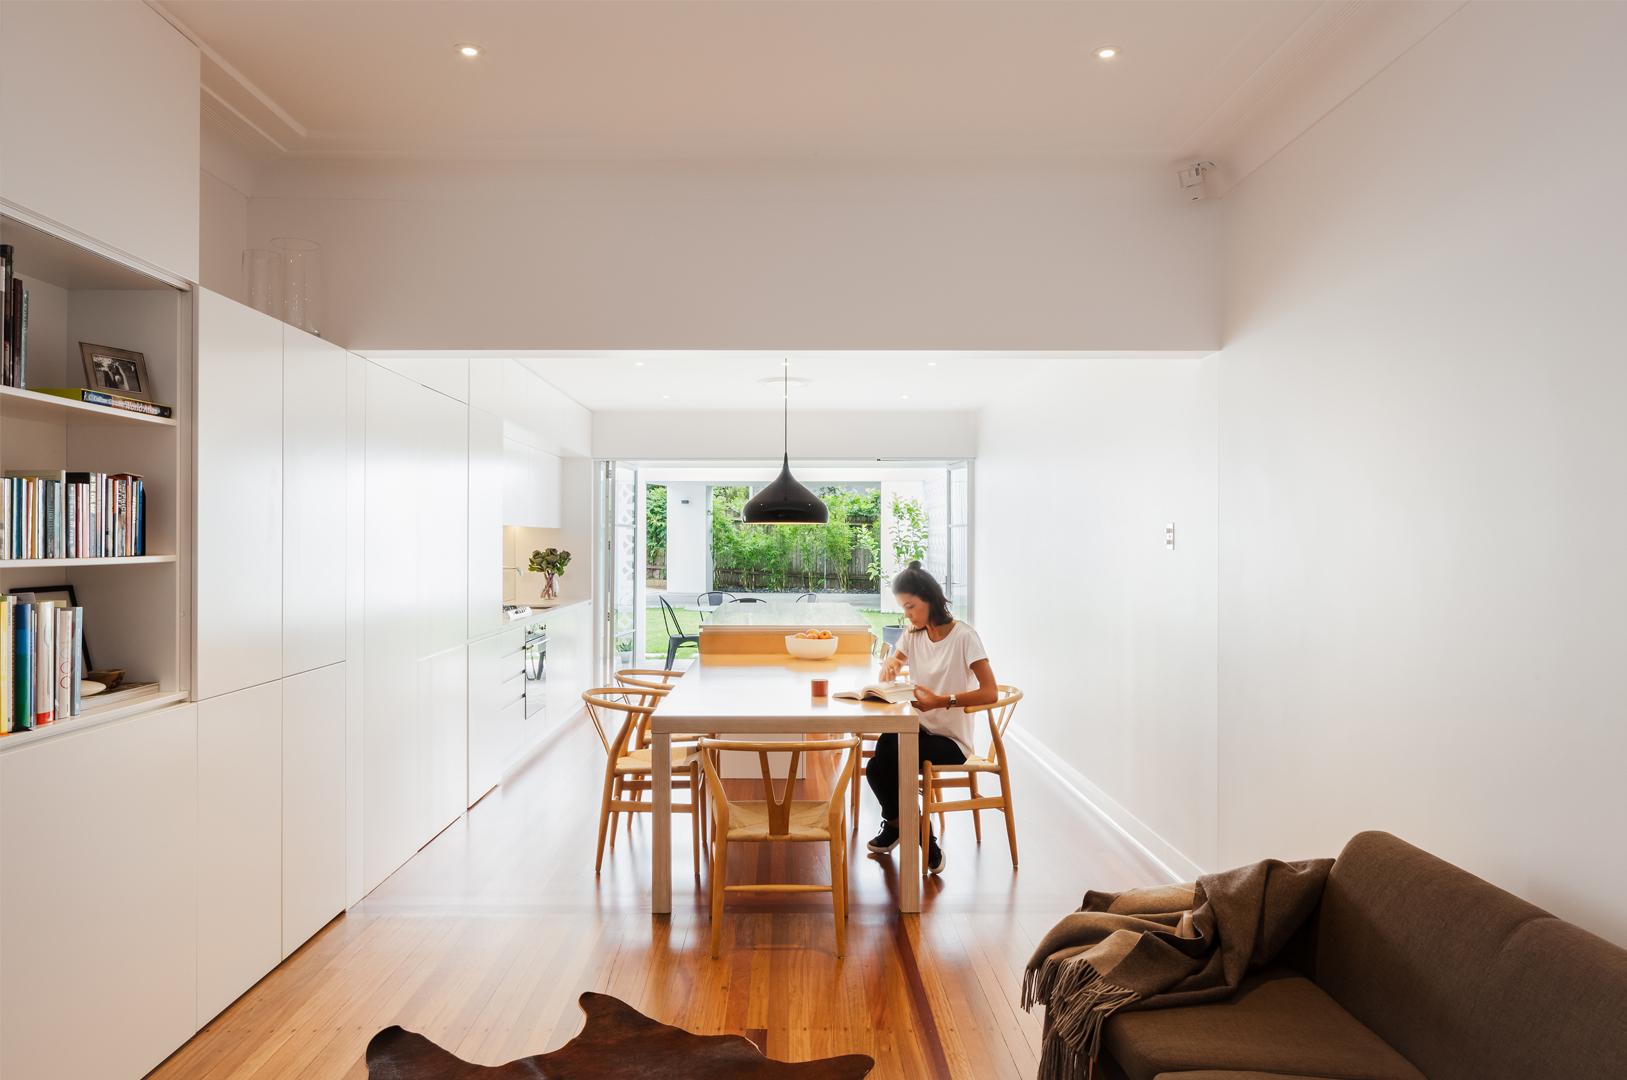 Breeze Block House Architect Prineas The Local Project Architecture U0026  Interior Design Image